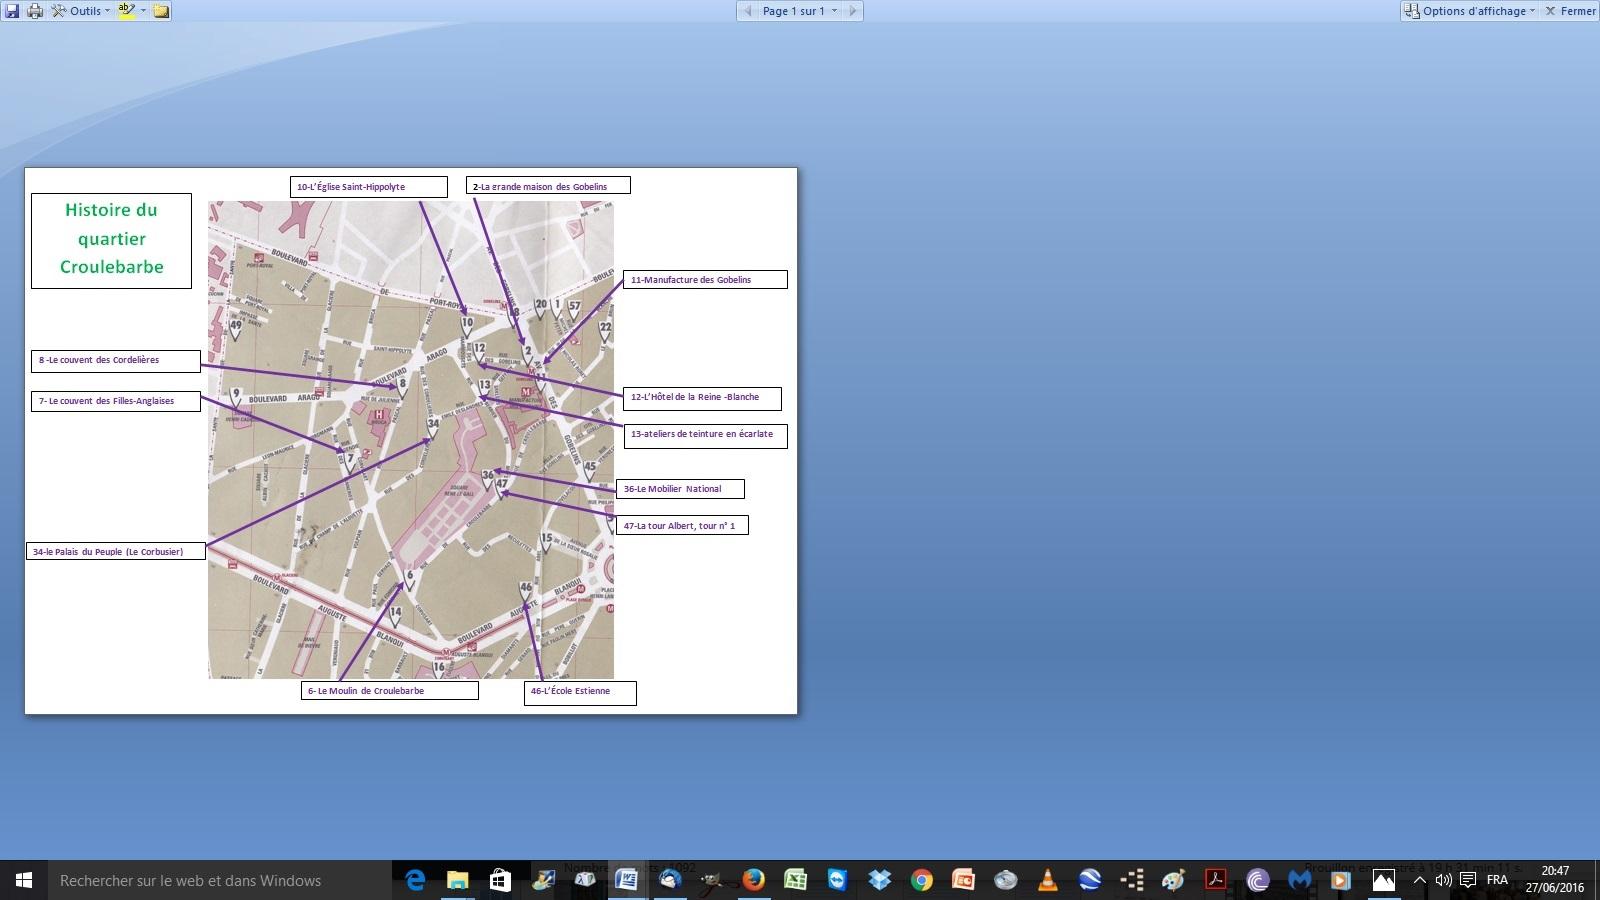 Plan quartier Croulebarbe